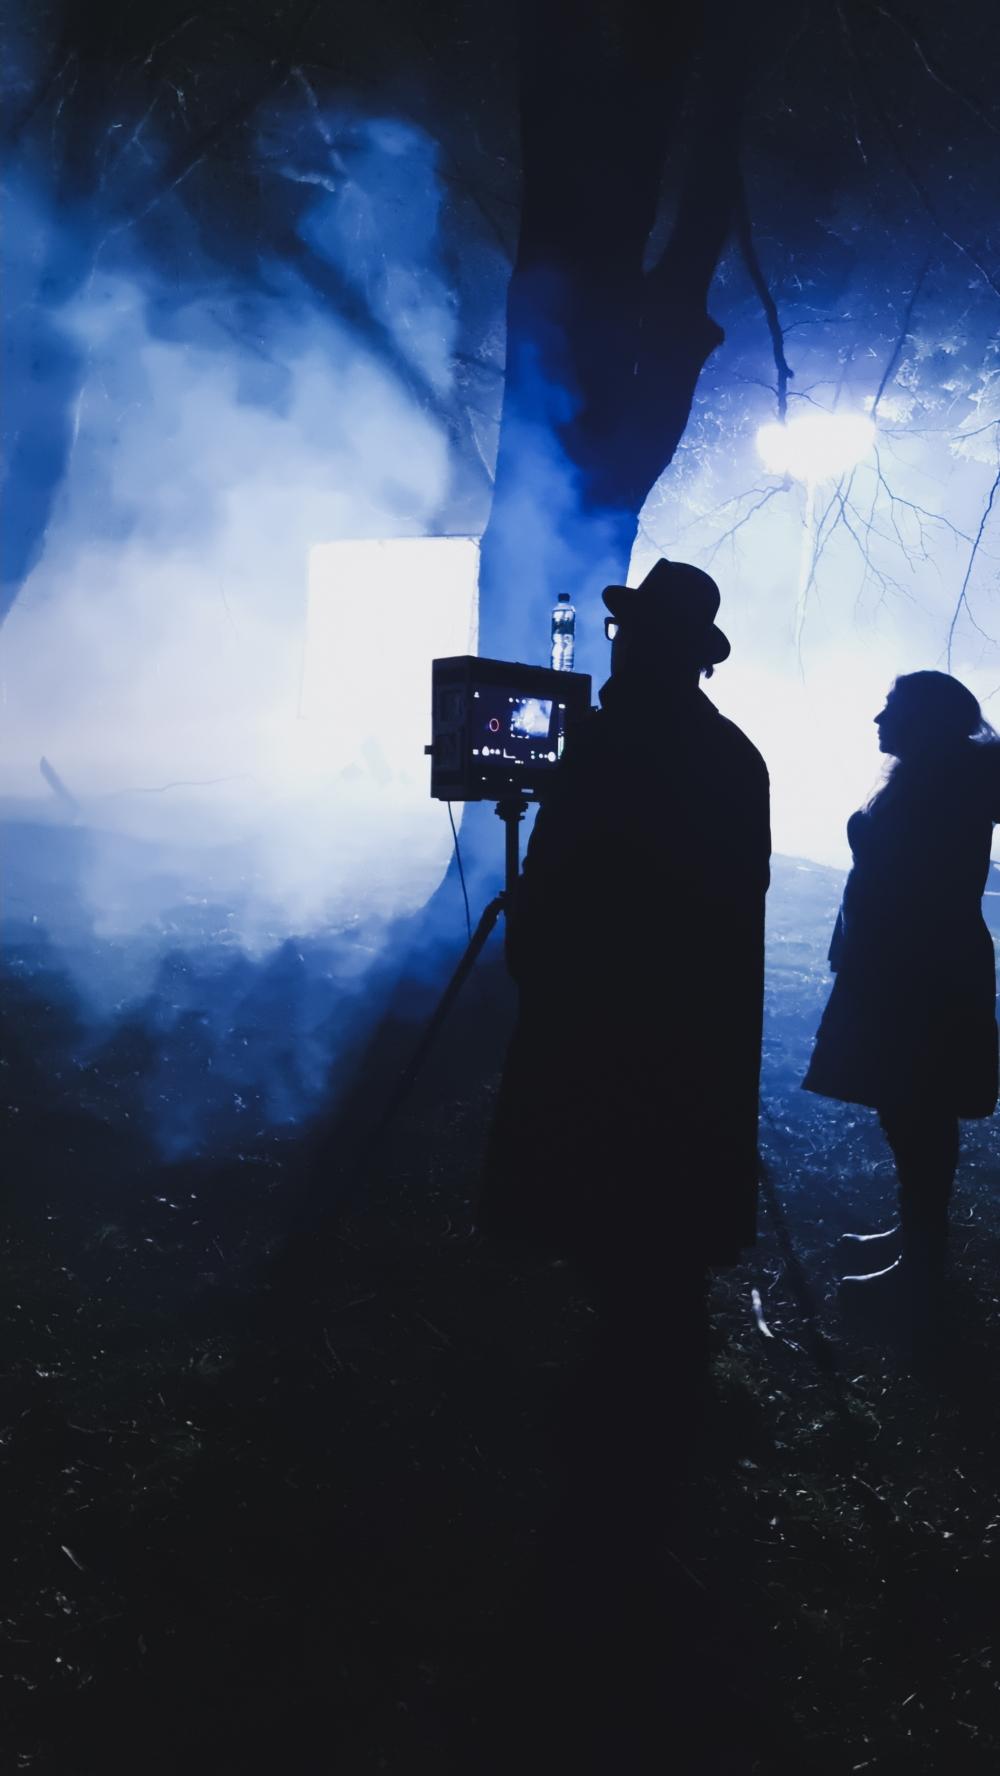 Shooting in progress using Samsung Galaxy S21 Ultra 5G